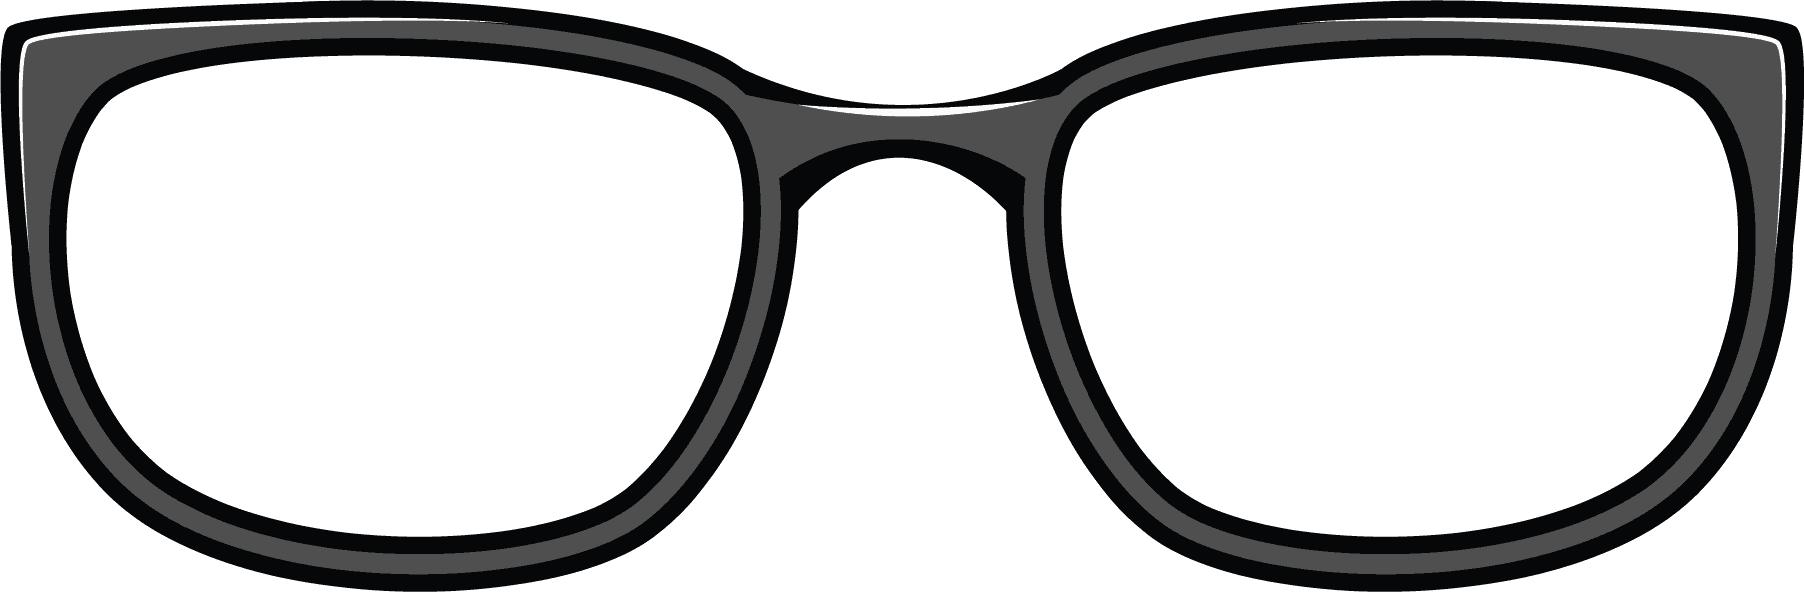 1804x592 Goggles Clipart